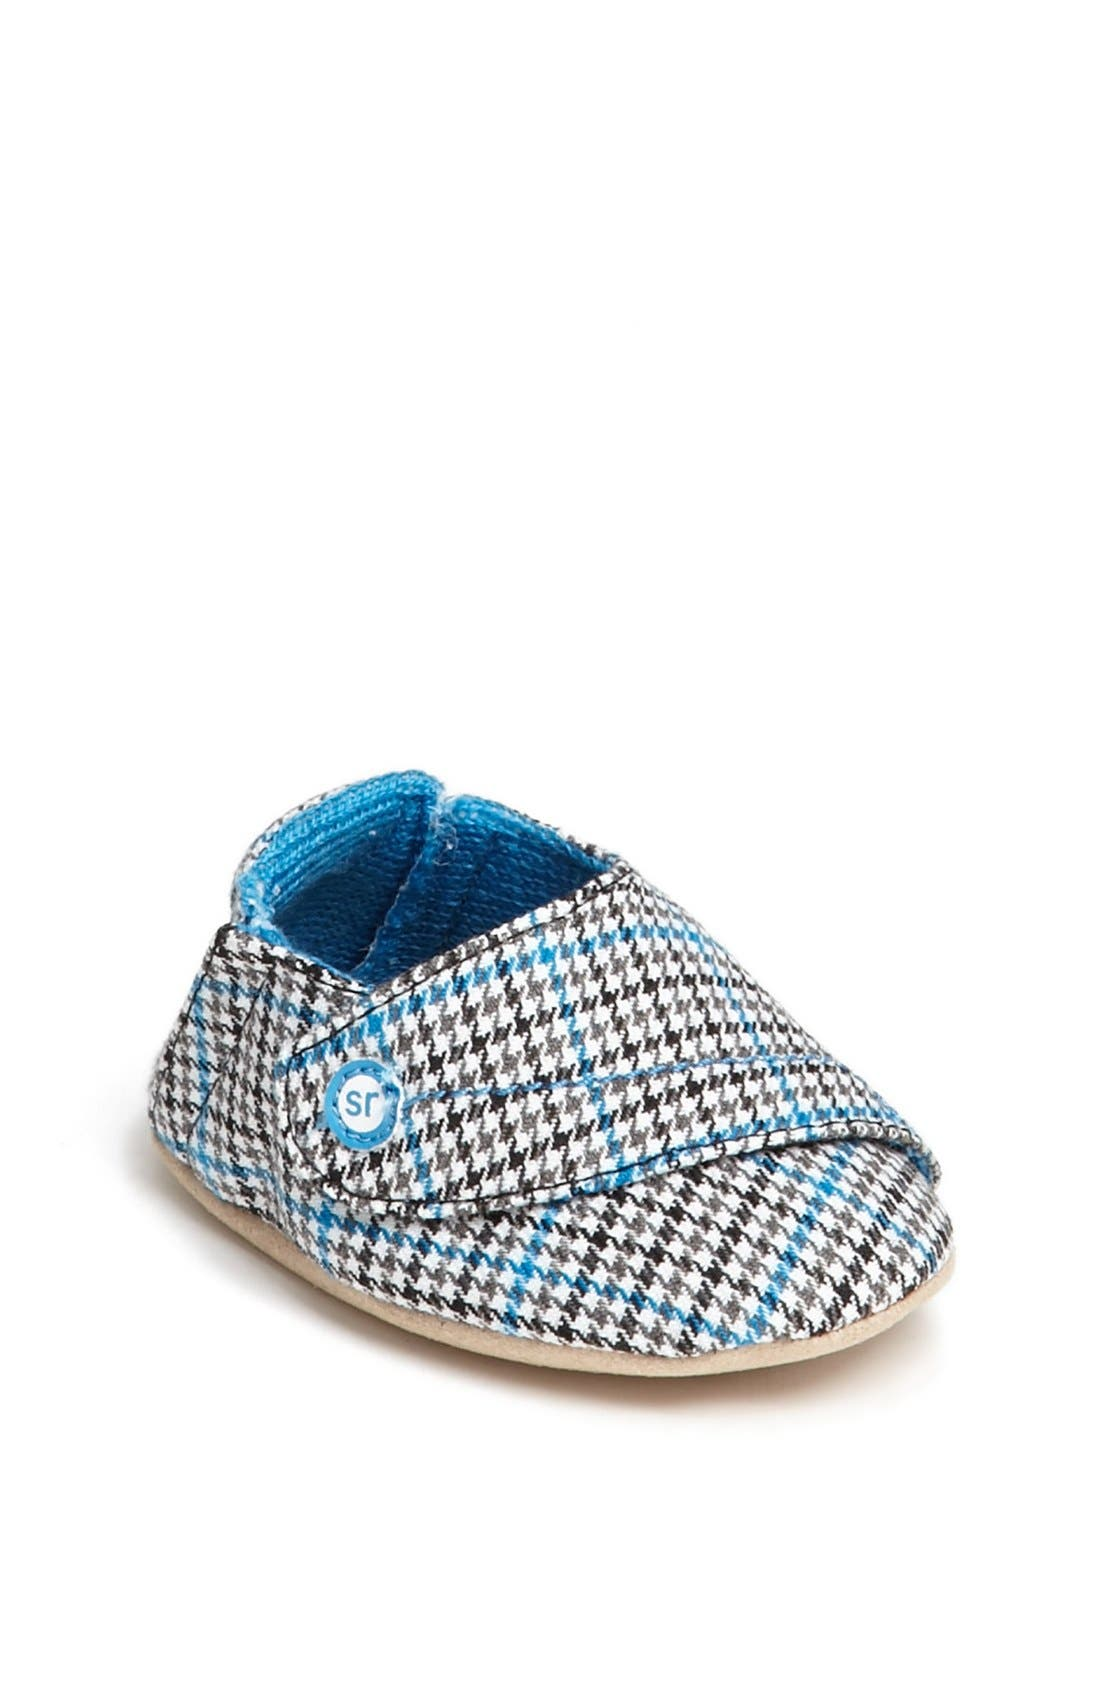 Main Image - Stride Rite 'Hip Houndstooth' Crib Shoe (Baby Boys)